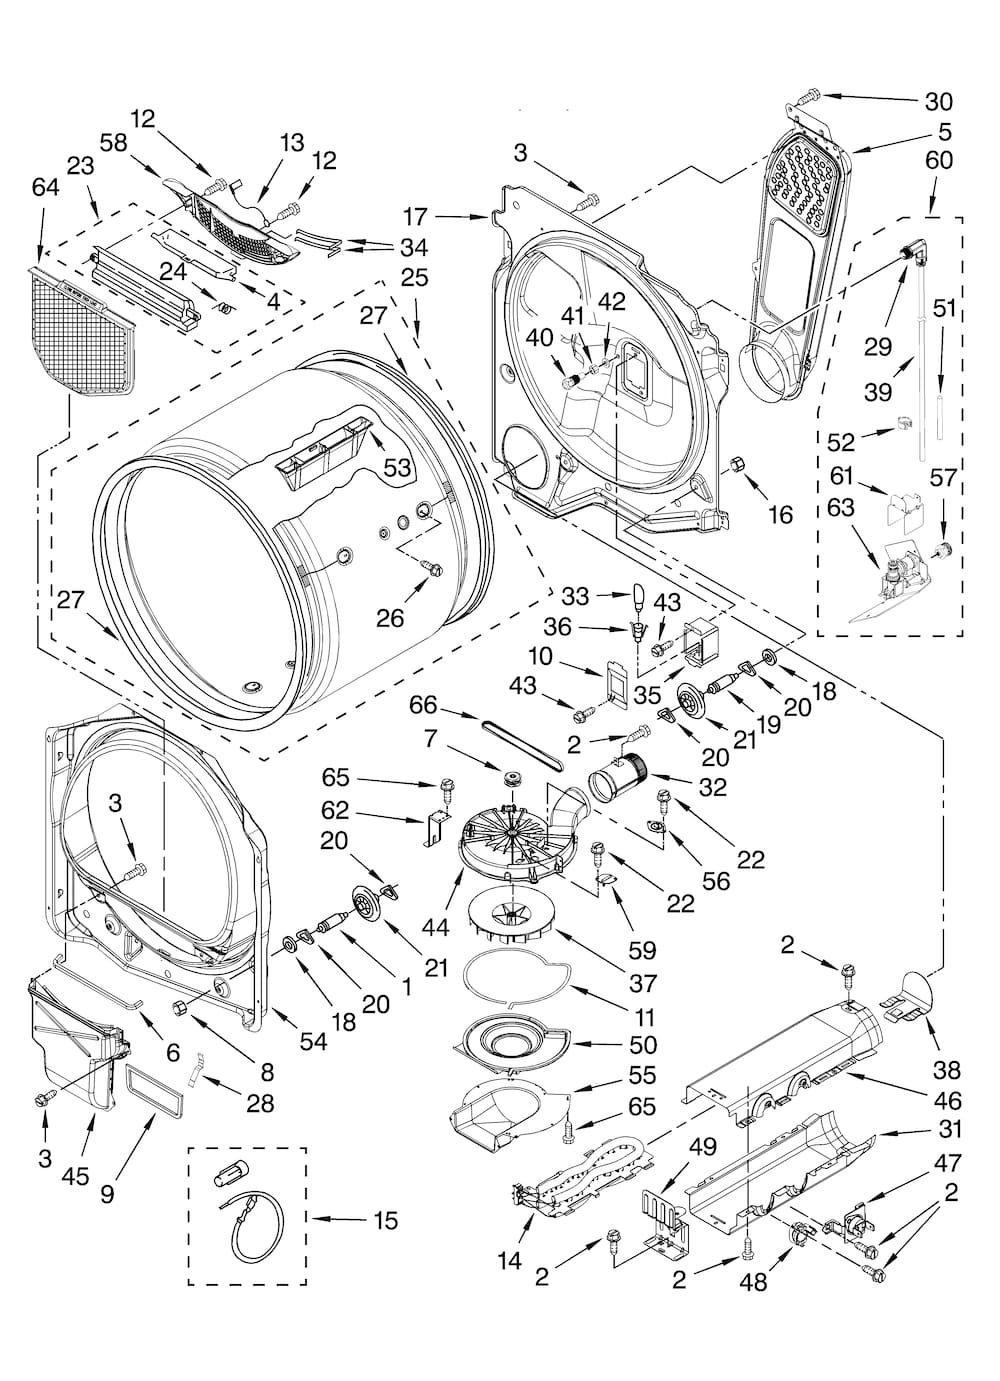 Kenmore Elite Residential Dryer Parts Model 11068062801 Sears Partsdirect Screen Door Kenmore Kenmore Elite